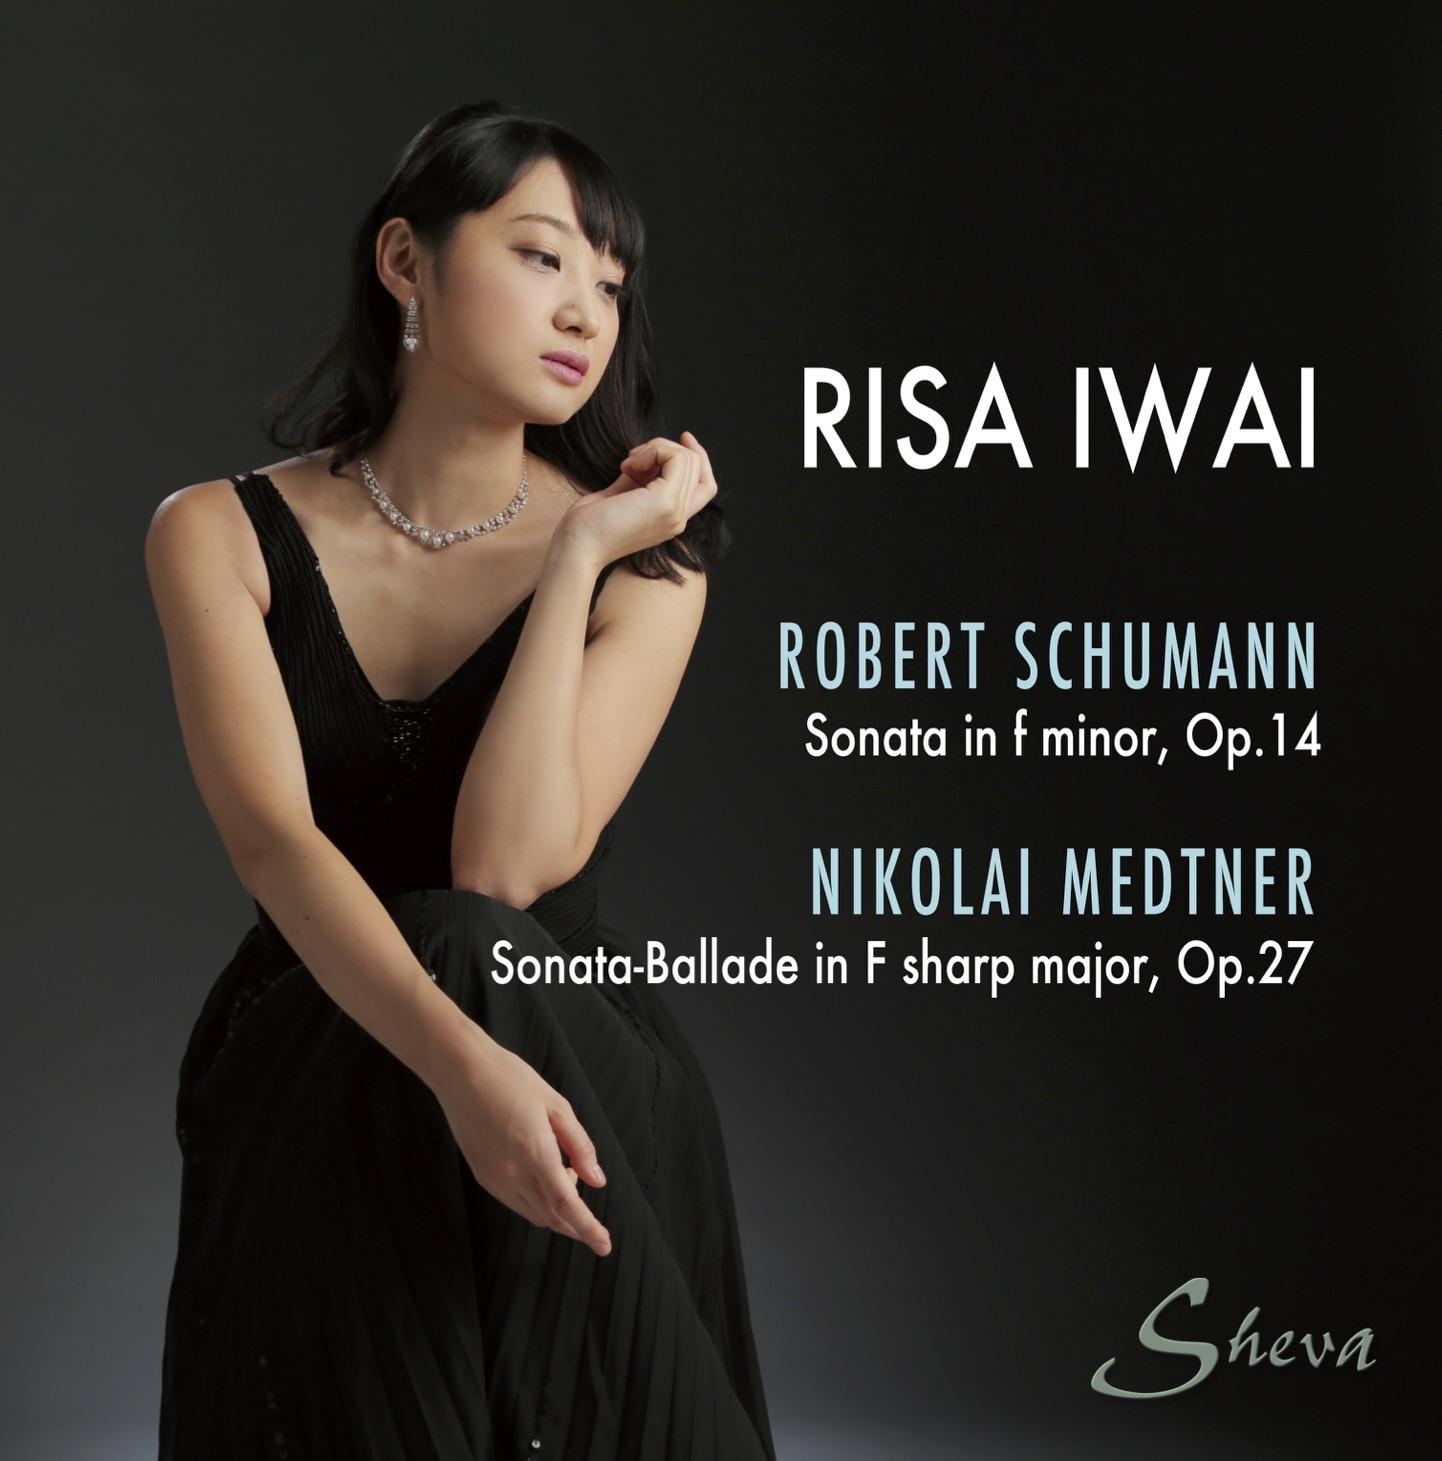 SHEVA 165 RISA IWAI plays Schumann Medtner